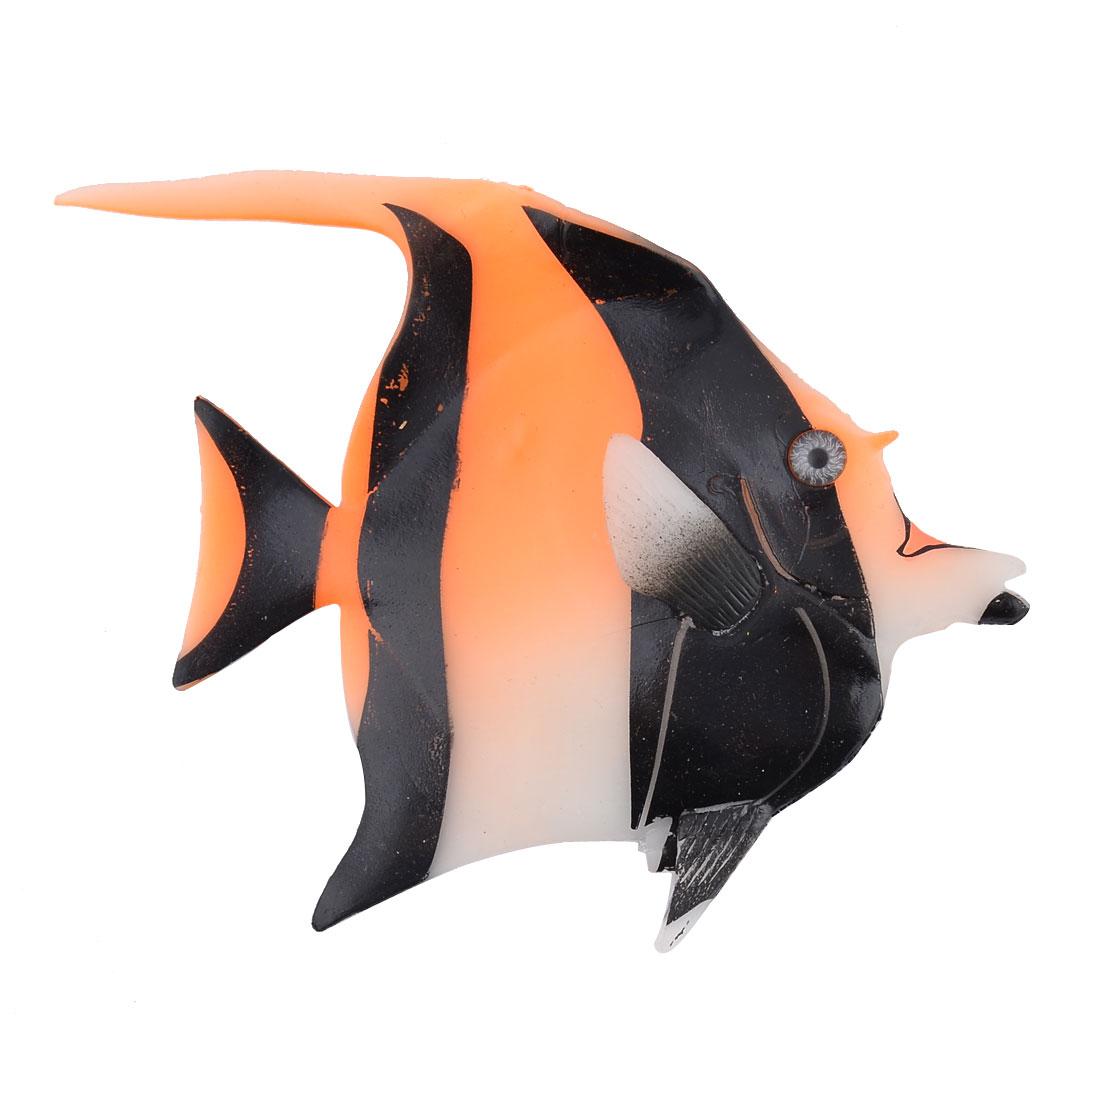 Aquarium Fish Tank Silicone Angelfish Decor Floating Ornament Model Toy Black